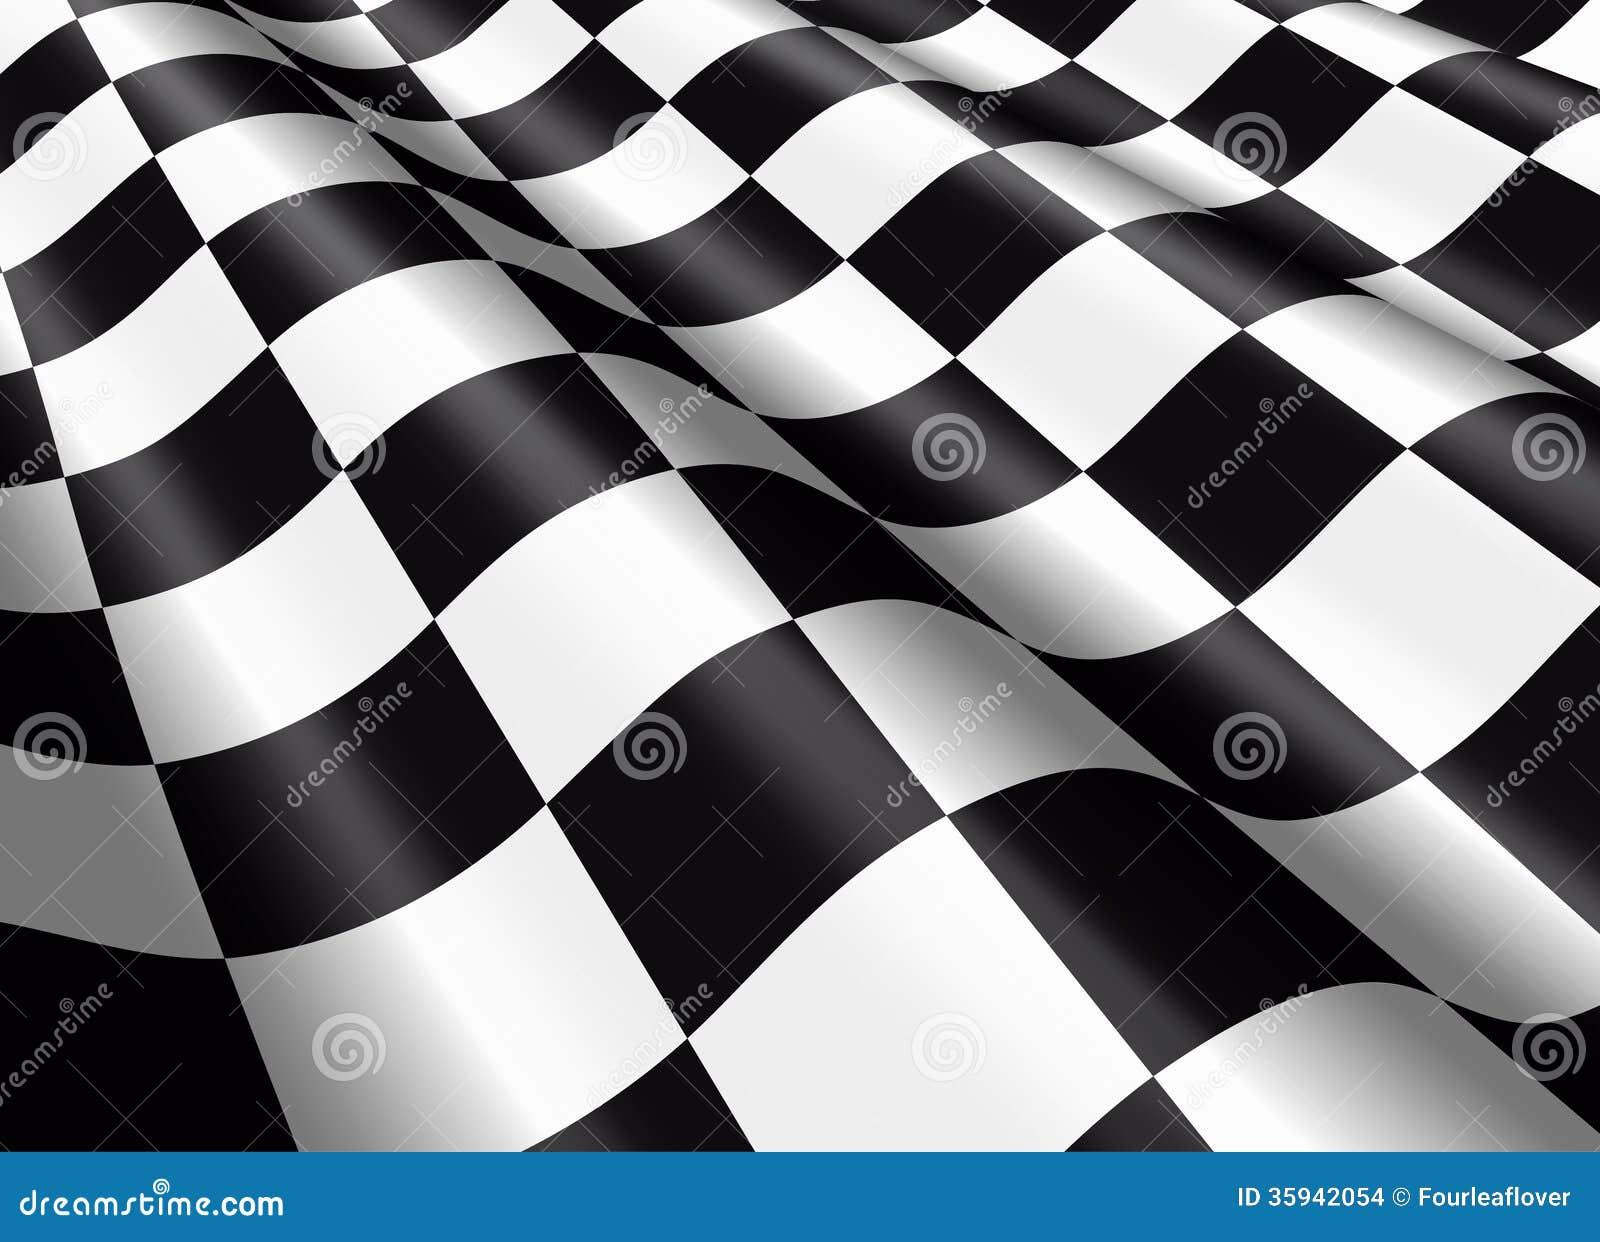 Finish Line Auto >> Chequered Flag Icon, Flat Style Vector Illustration | CartoonDealer.com #79972122